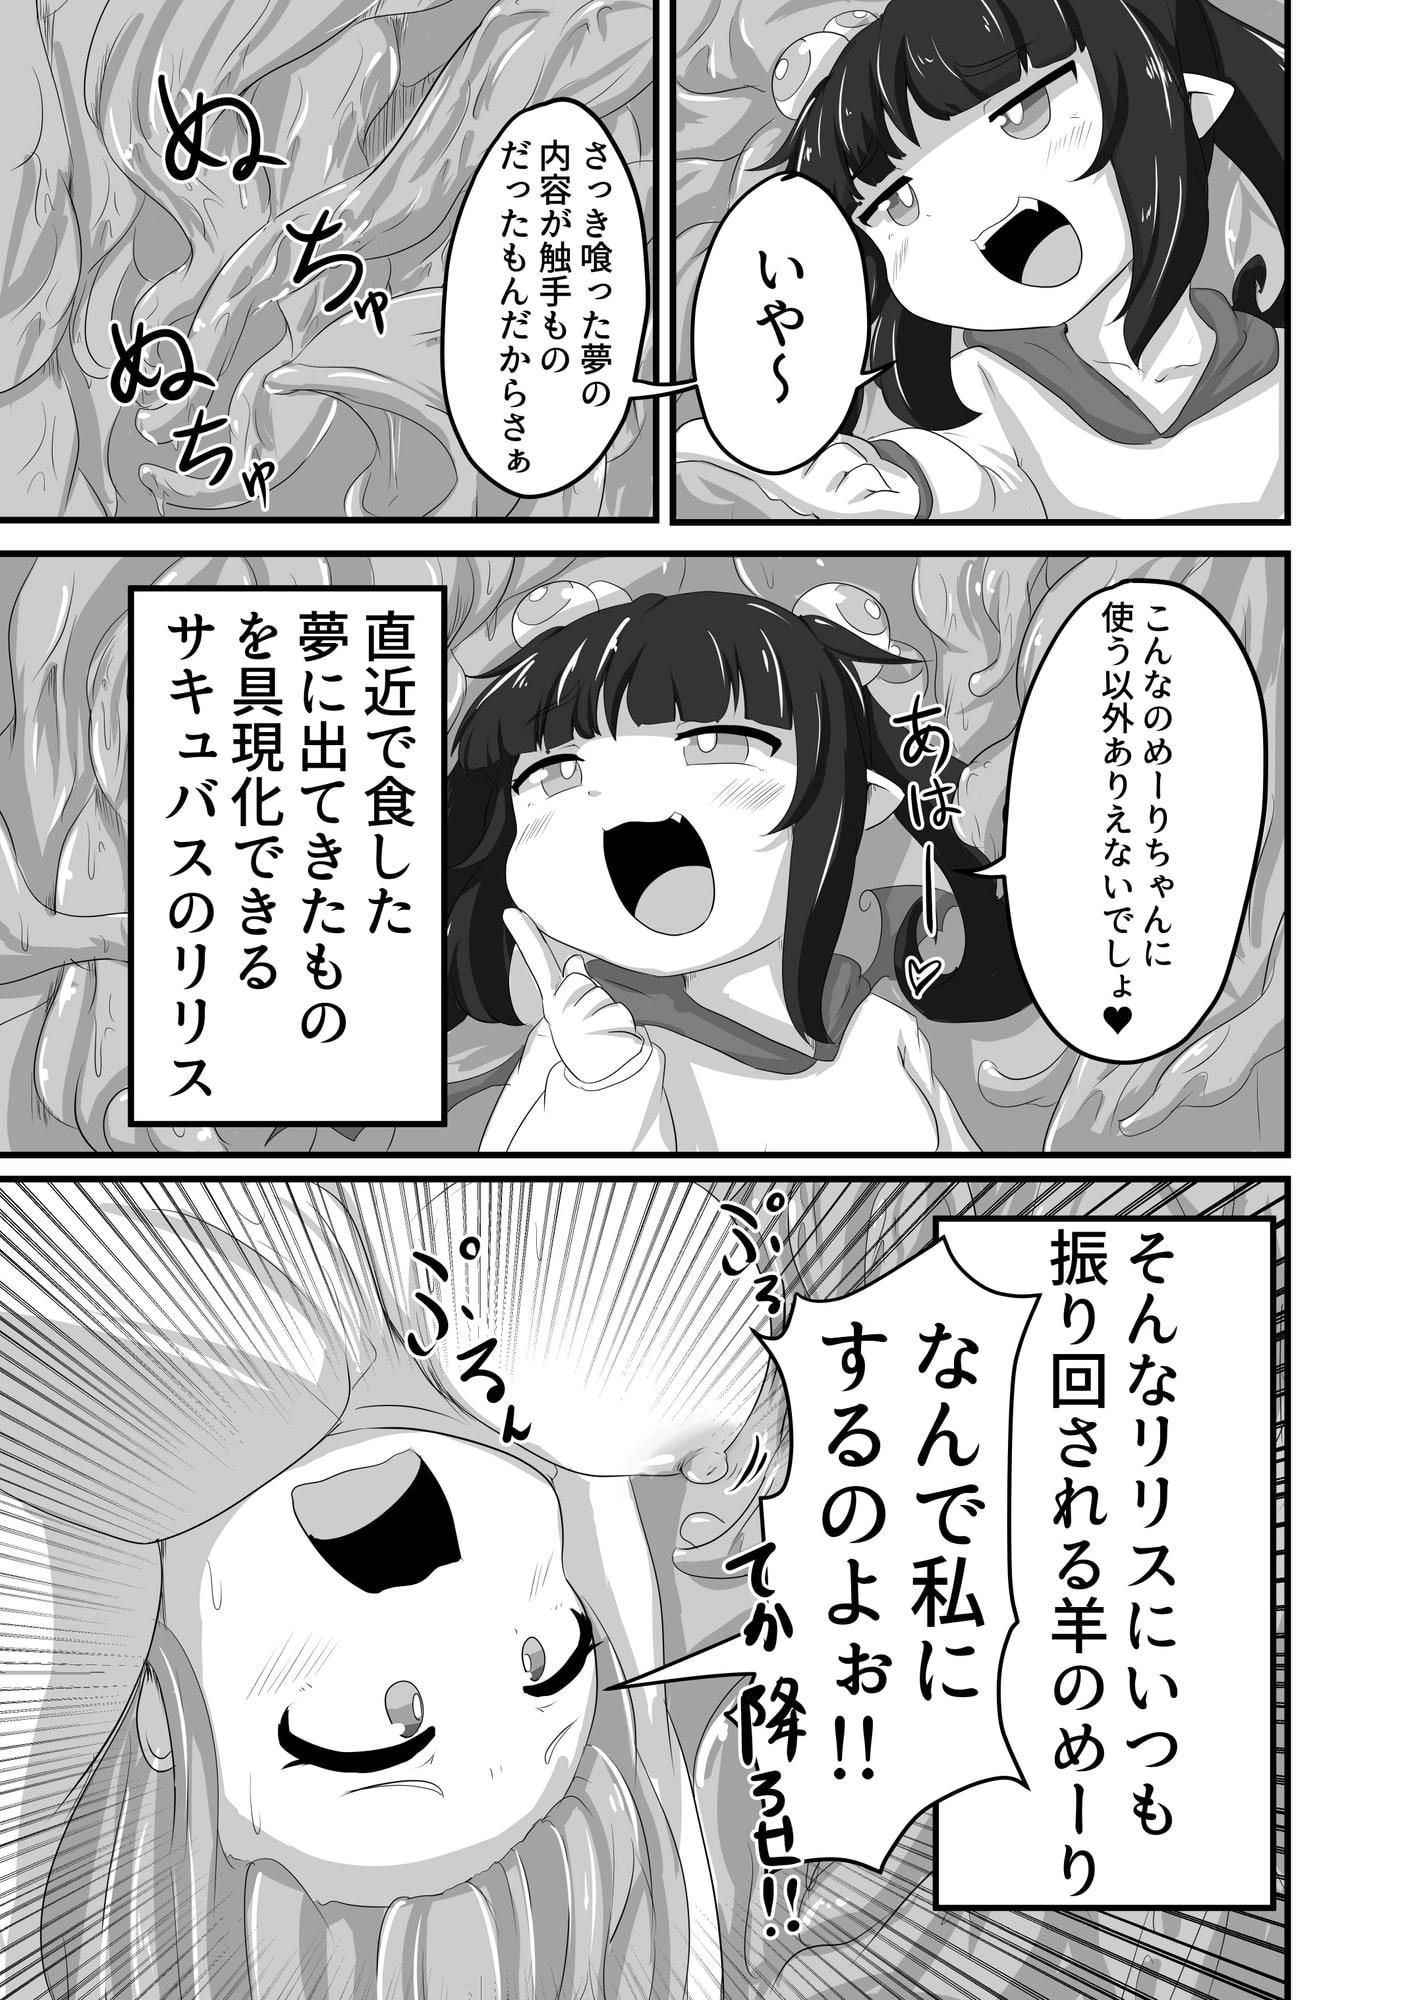 RJ320994 リリスとめーりの戯れ~触手と遊ぼう~ [20210320]